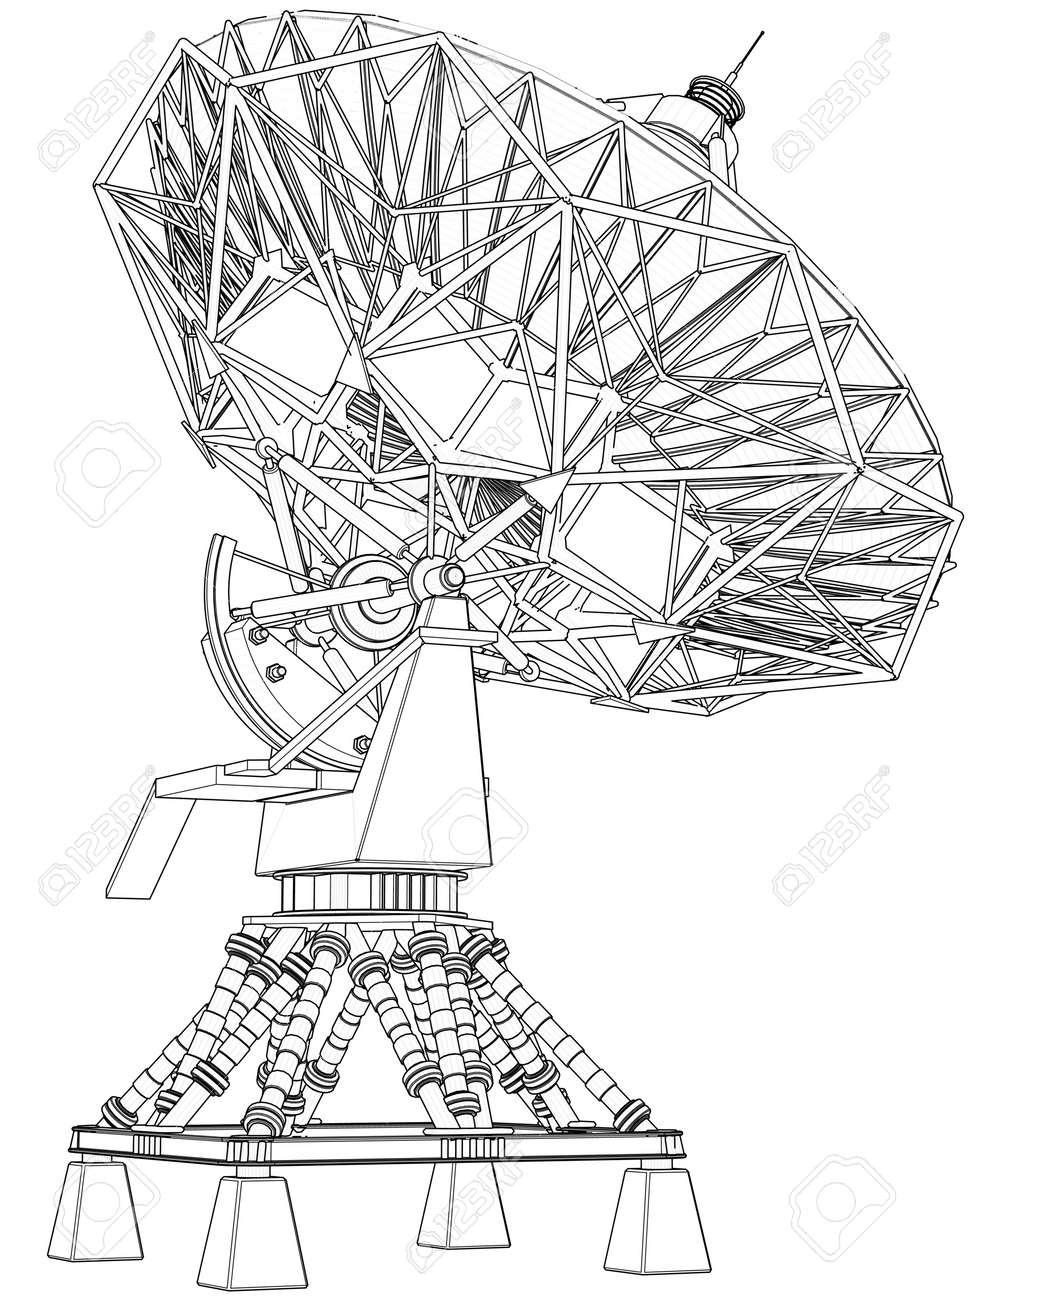 satellite dishes antenna doppler radar technical draw stock photo Satellite Dish Pond satellite dishes antenna doppler radar technical draw stock photo 2470825